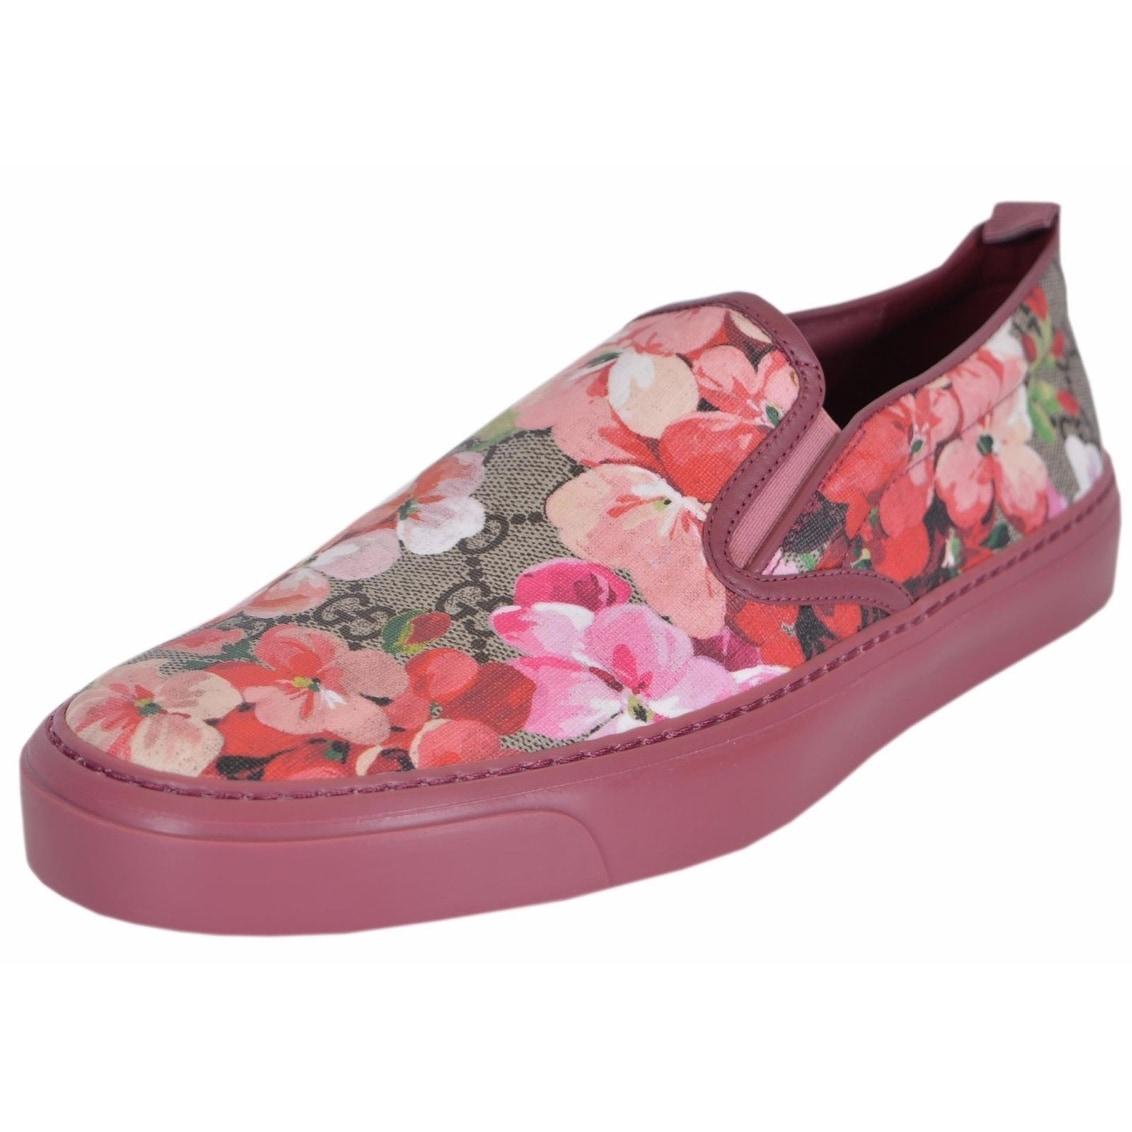 GG Supreme Canvas Pink Blooms Slip